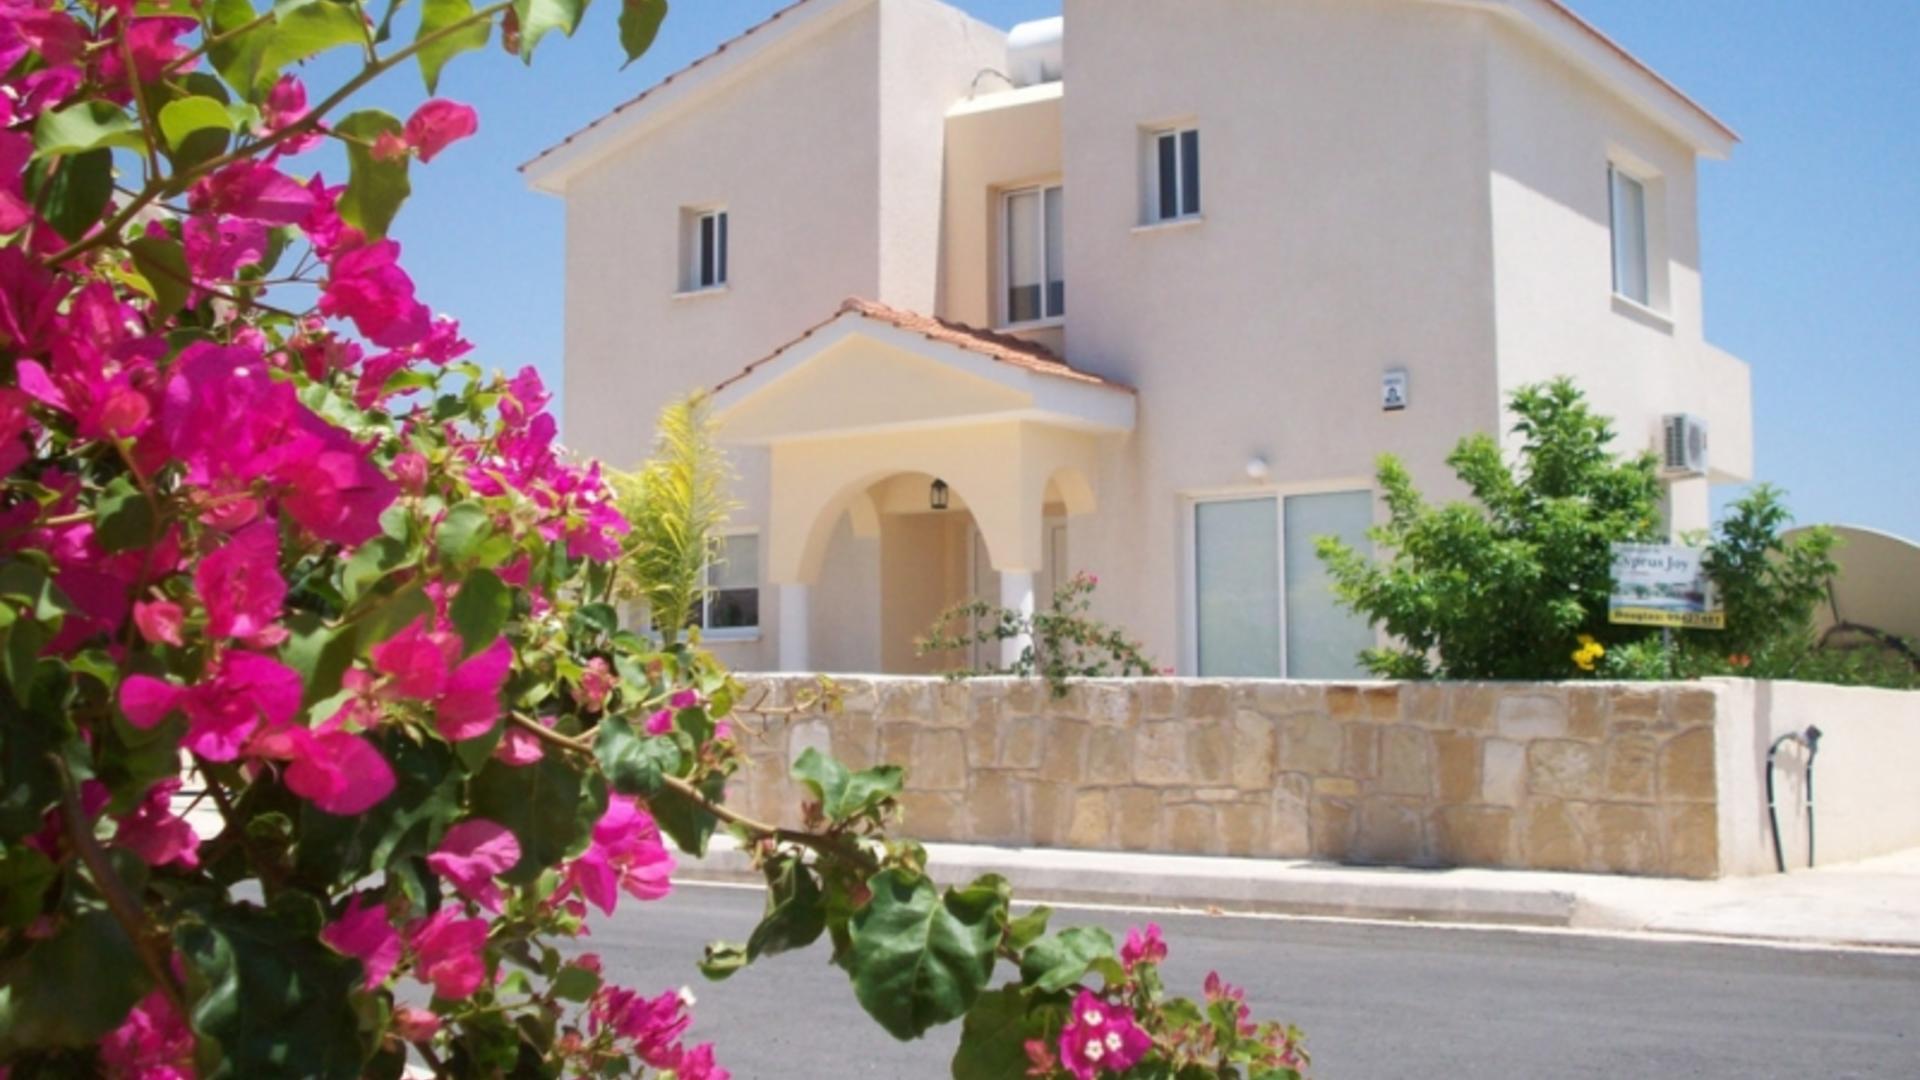 2 Bedroom Private villa in  Cyprus